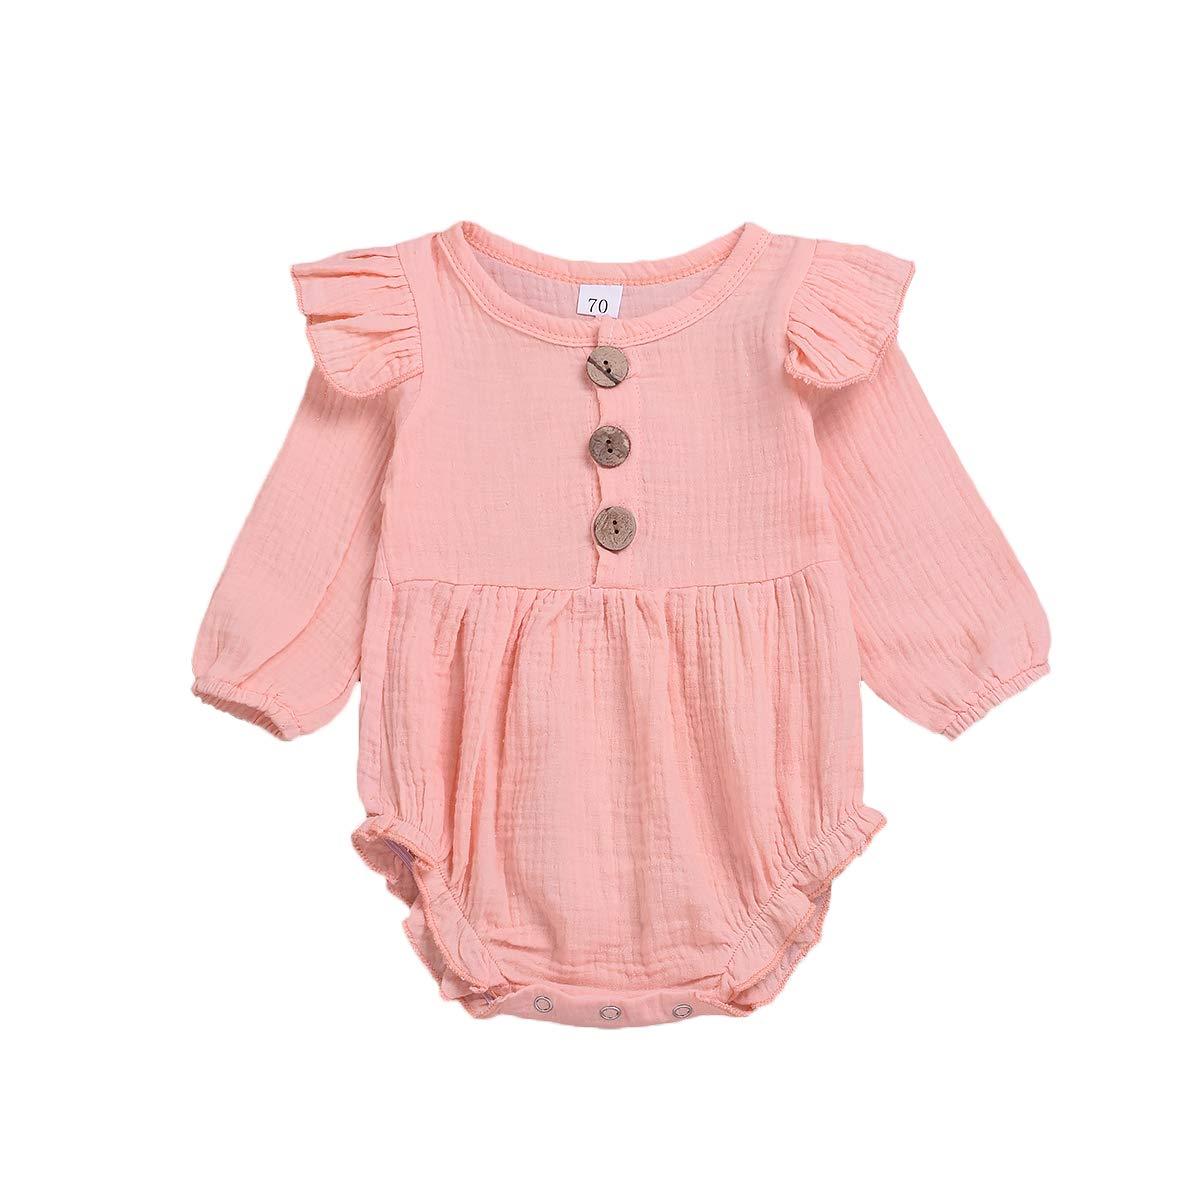 Infant Baby Girls Ruffle Long Sleeve Romper Bodysuit Seersucker Jumpsuit Overall Playsuit 0-24M